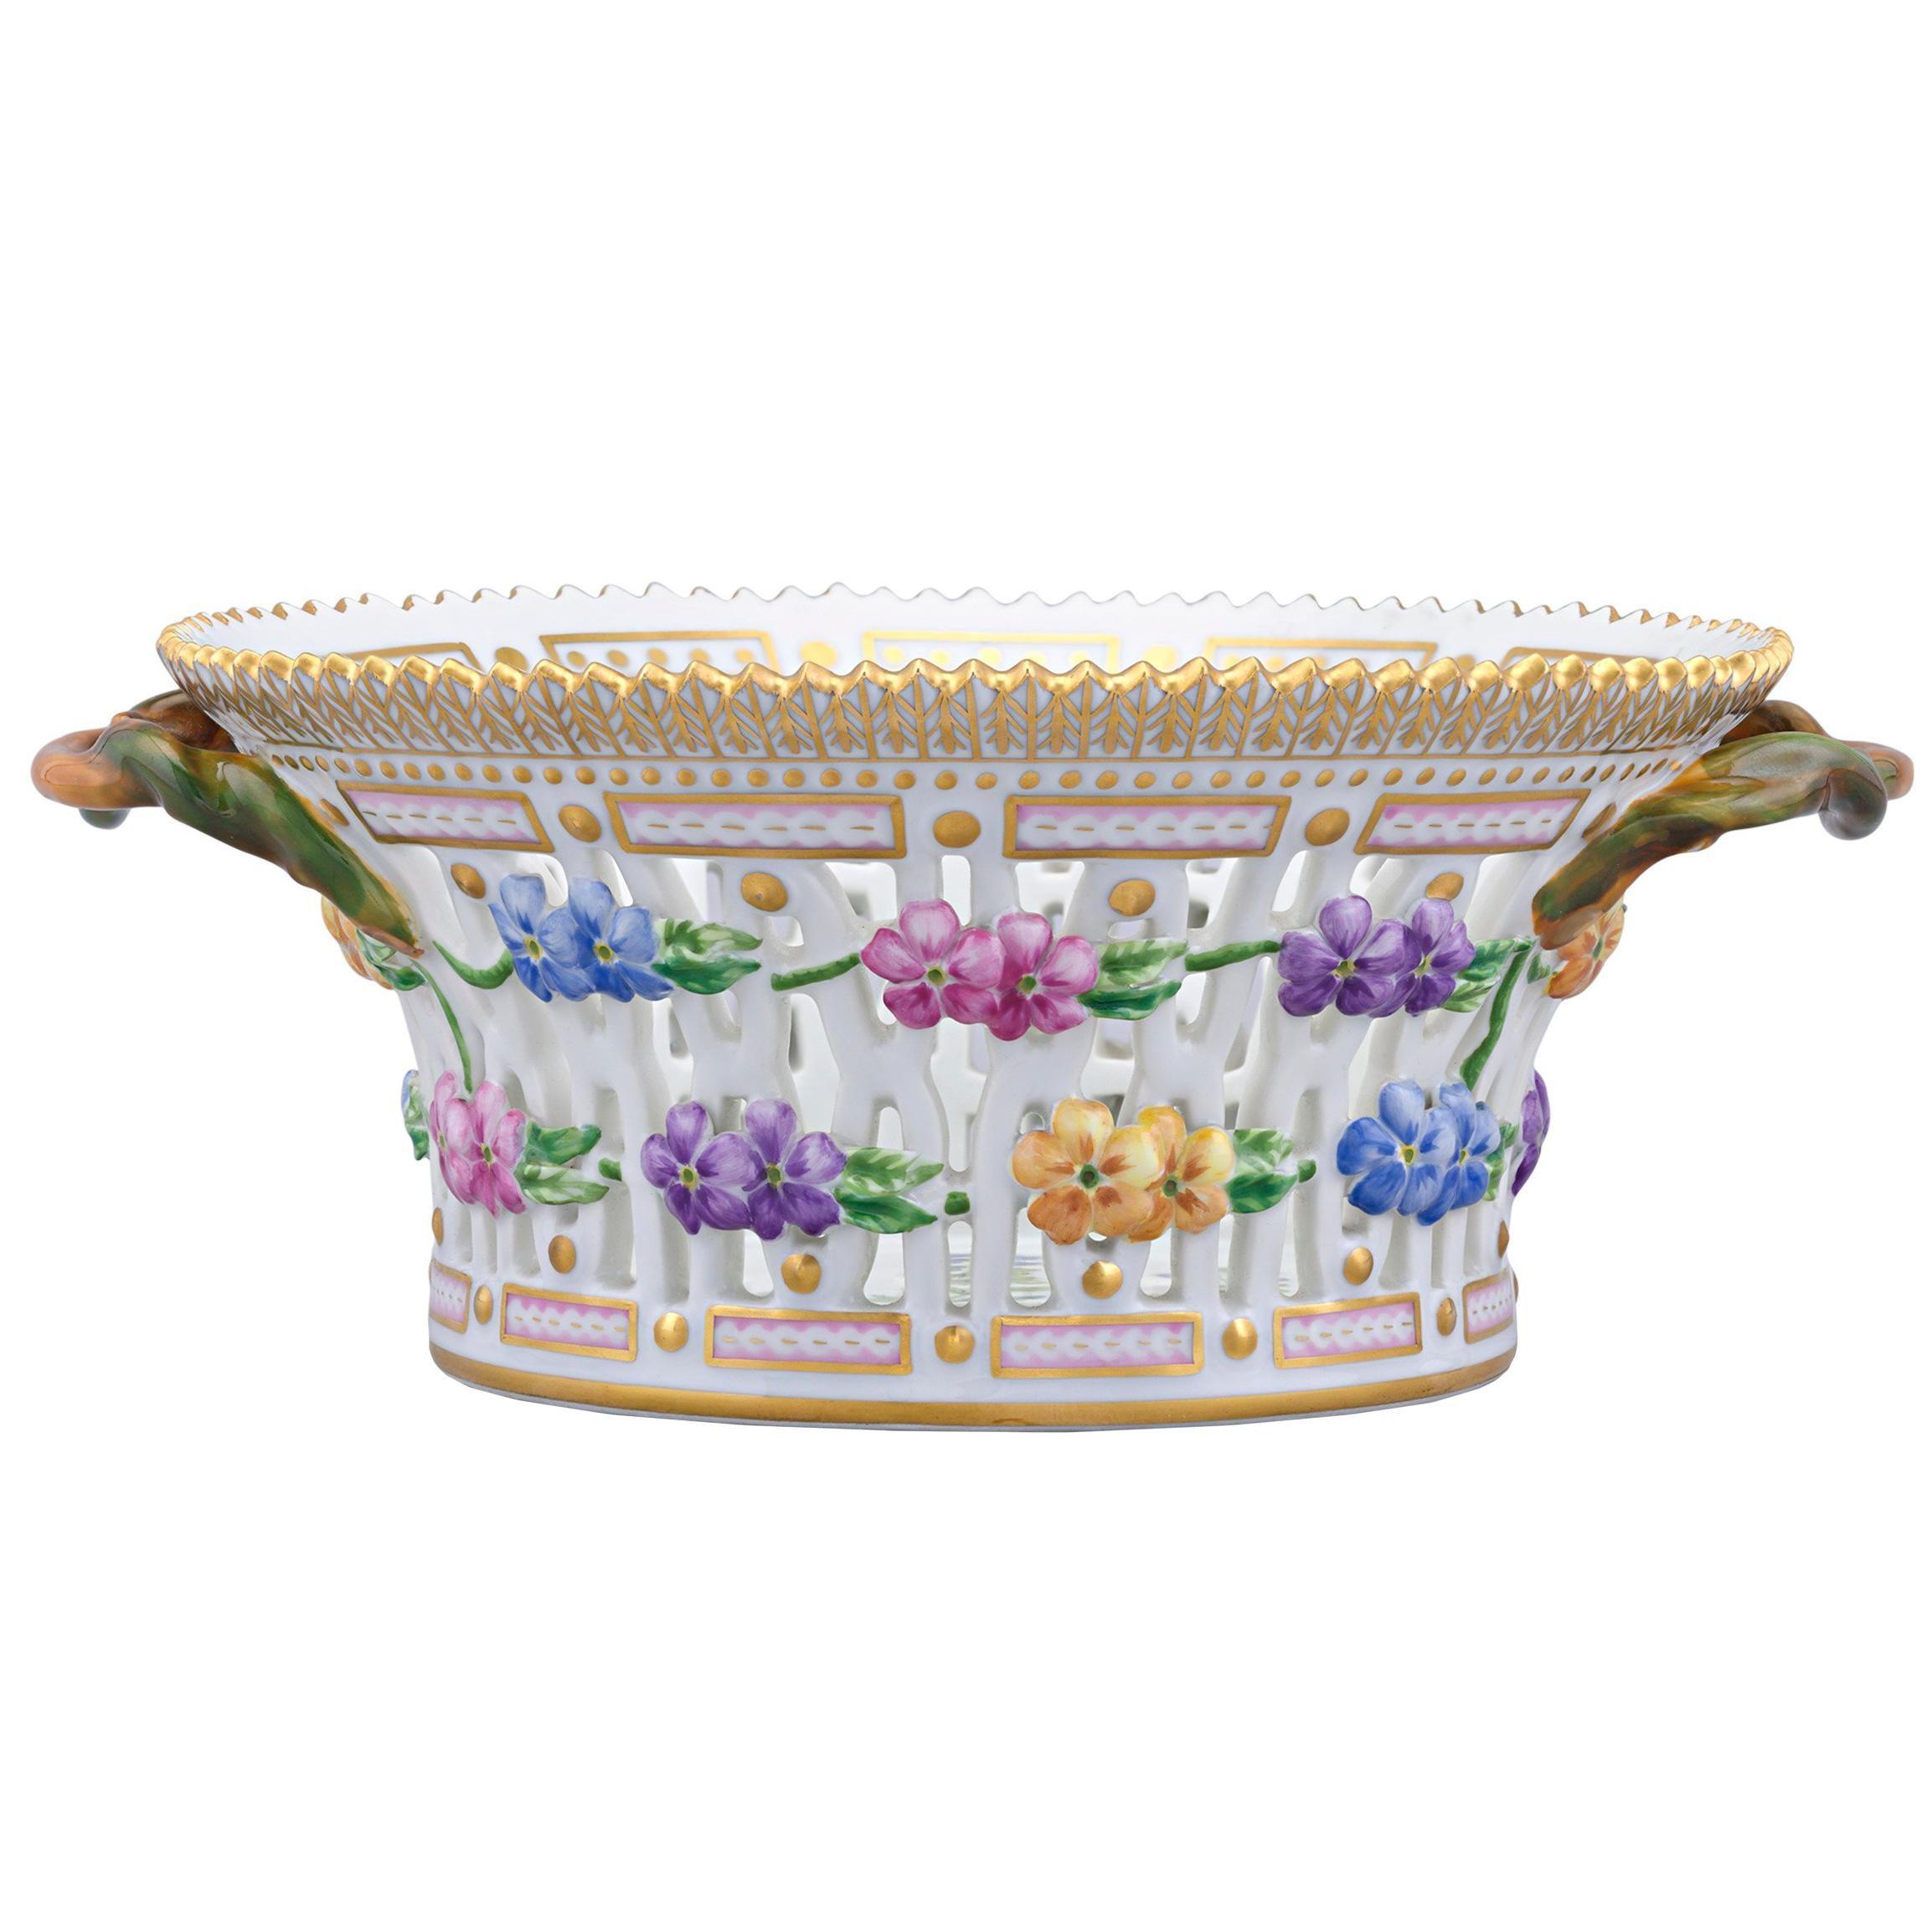 Flora Danica Pierced Porcelain Basket by Royal Copenhagen